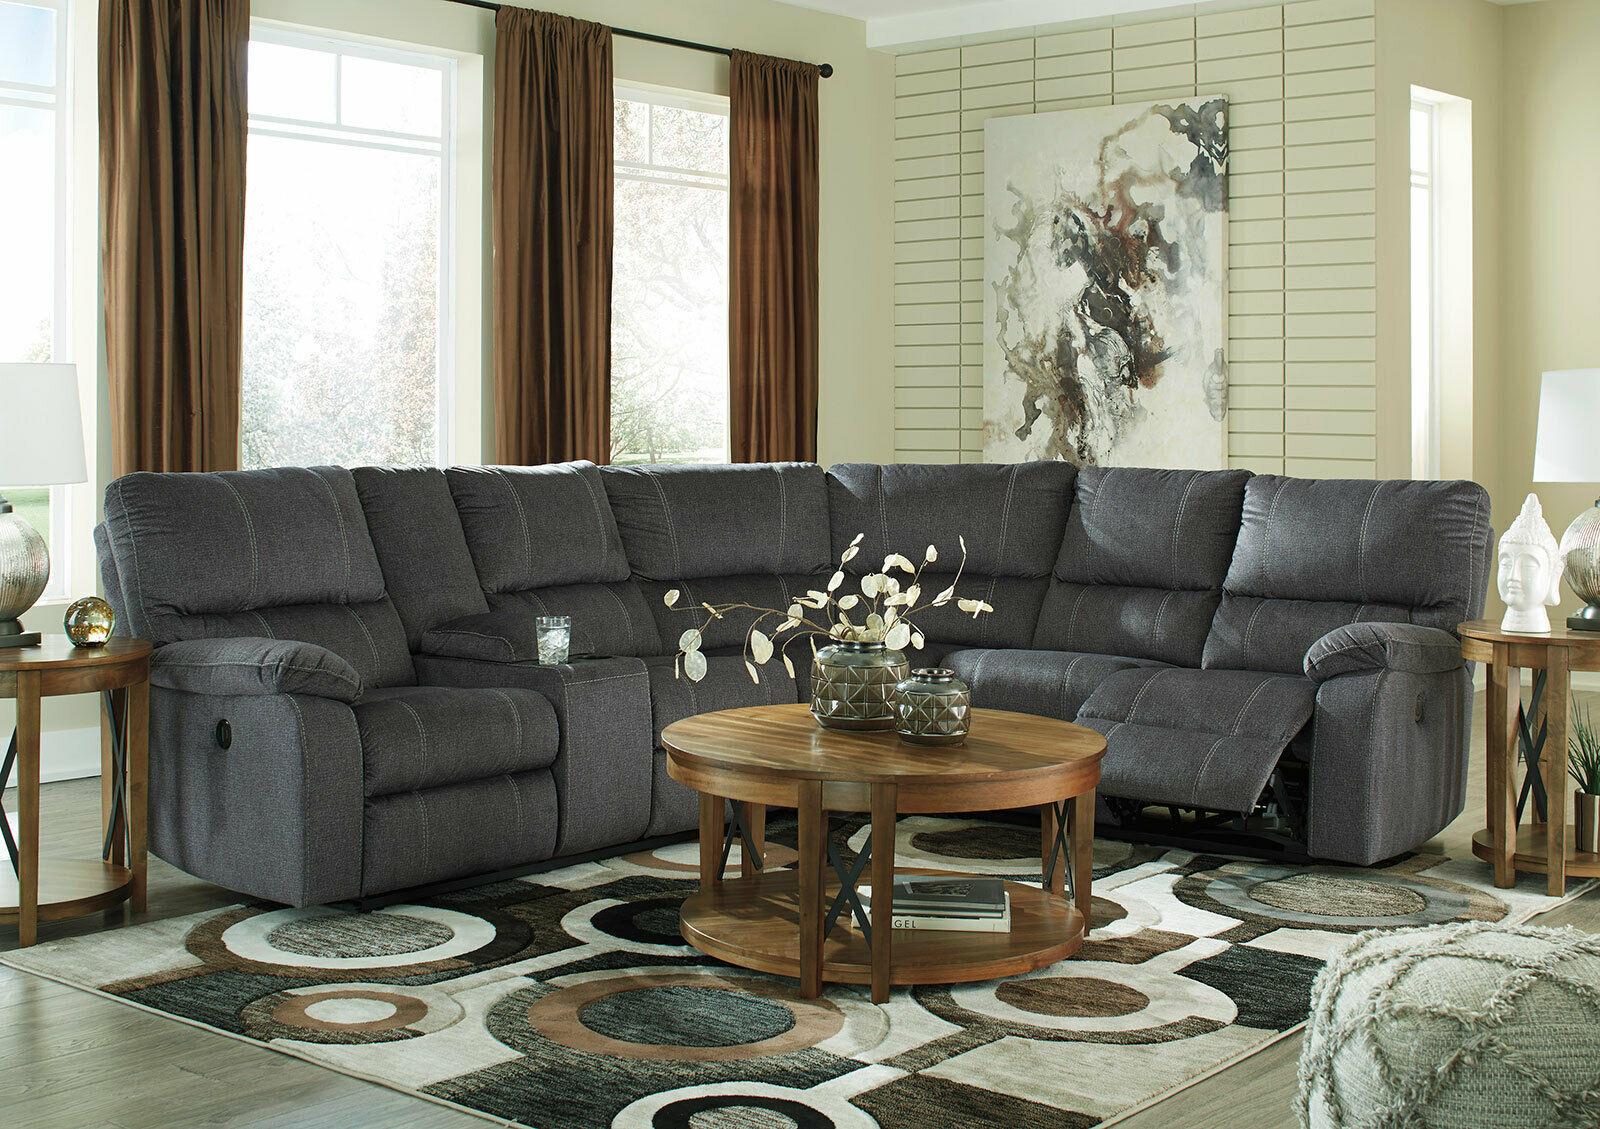 Modern living room sectional gray fabric reclining sofa - Fabric reclining living room sets ...